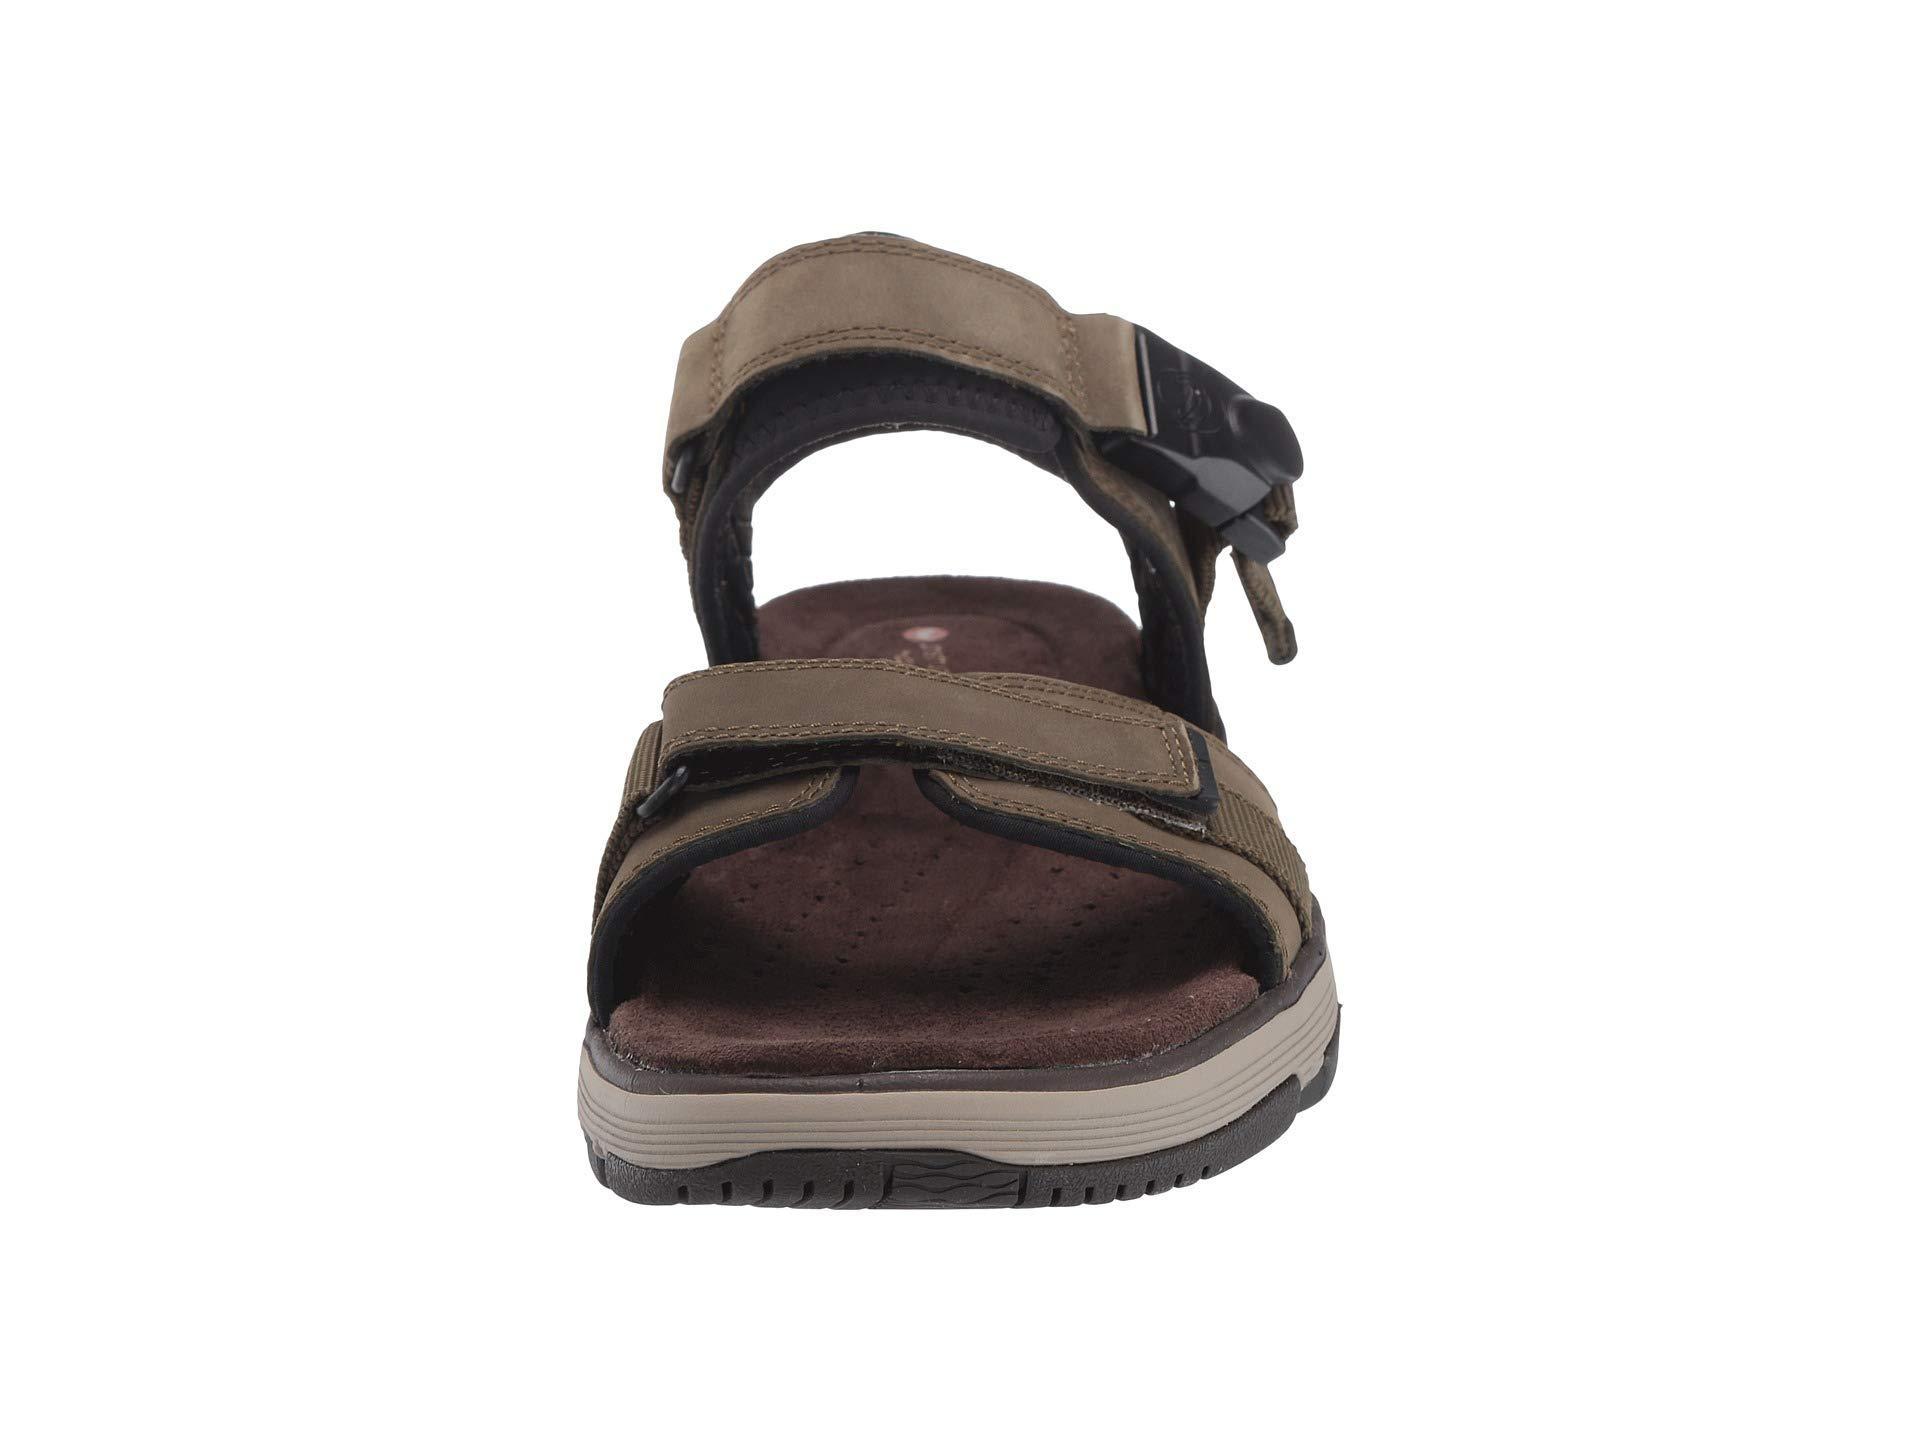 206e9ce635cd Lyst - Clarks Untrek Part (dark Tan Leather) Men s Sandals in Brown ...